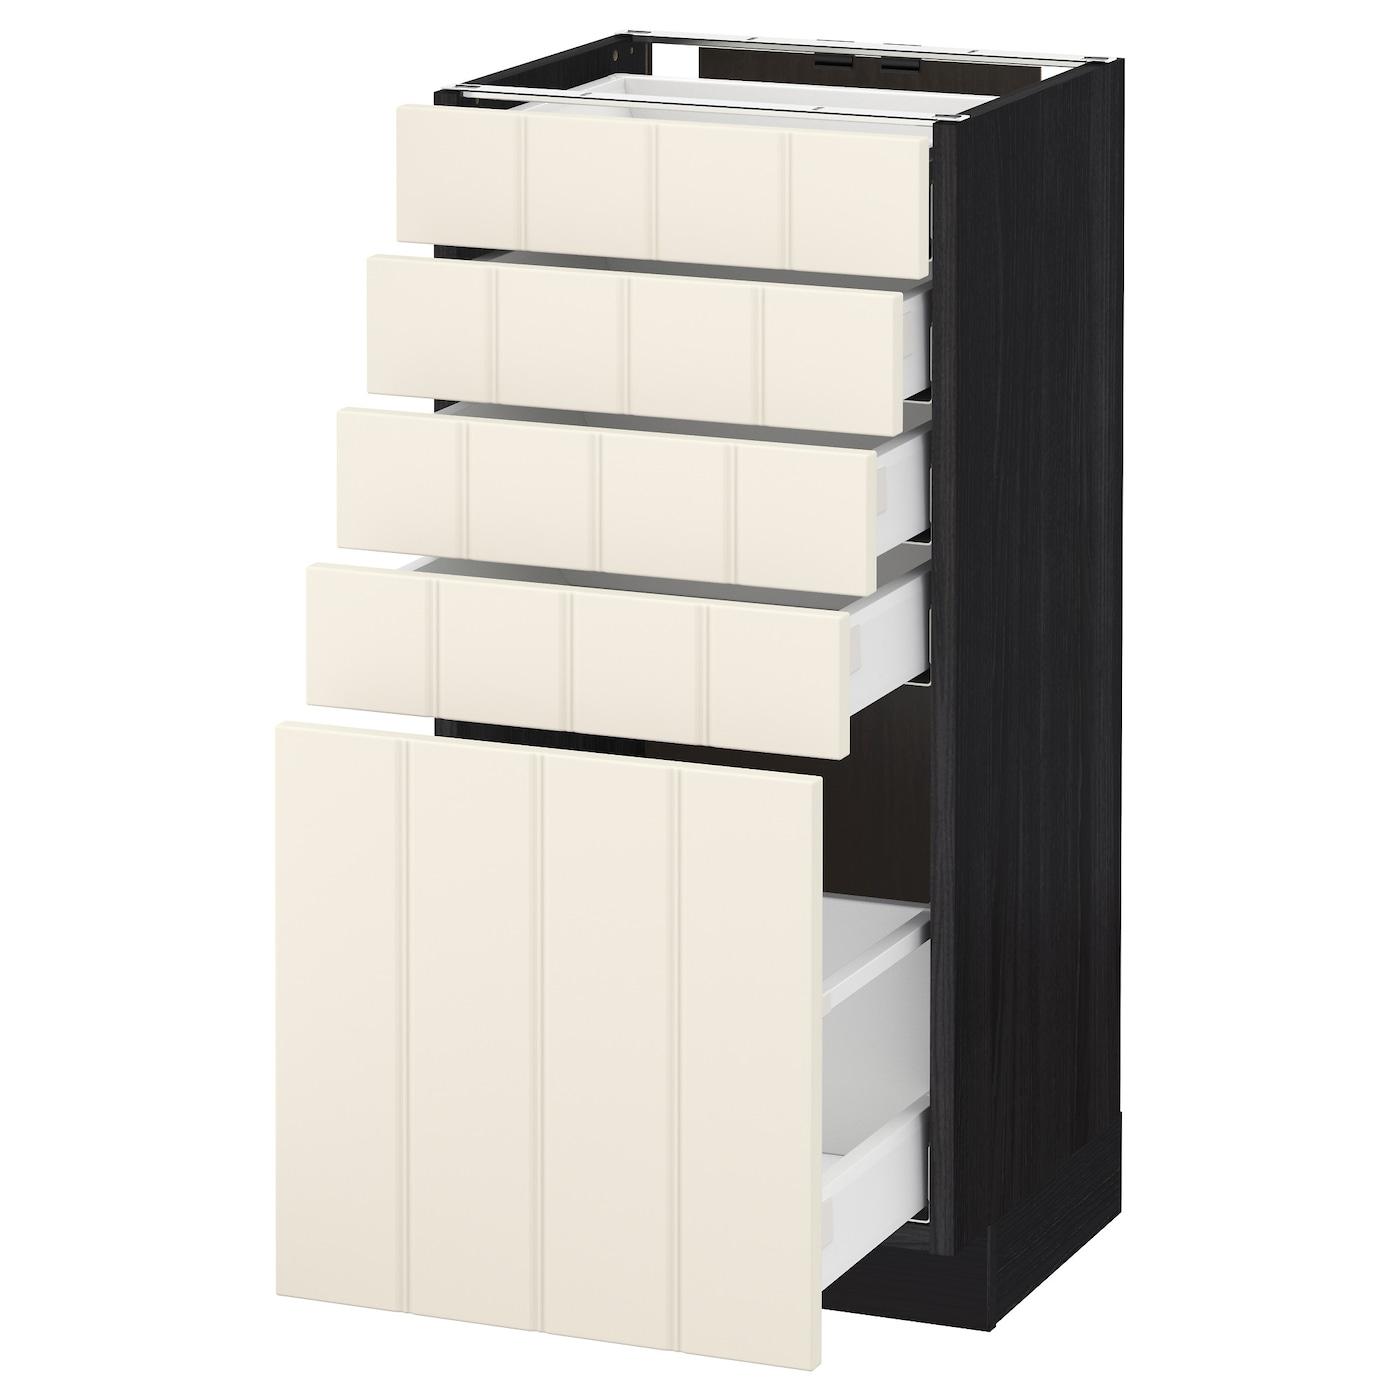 metod maximera base cabinet with 5 drawers black hittarp off white 40 x 37 cm ikea. Black Bedroom Furniture Sets. Home Design Ideas